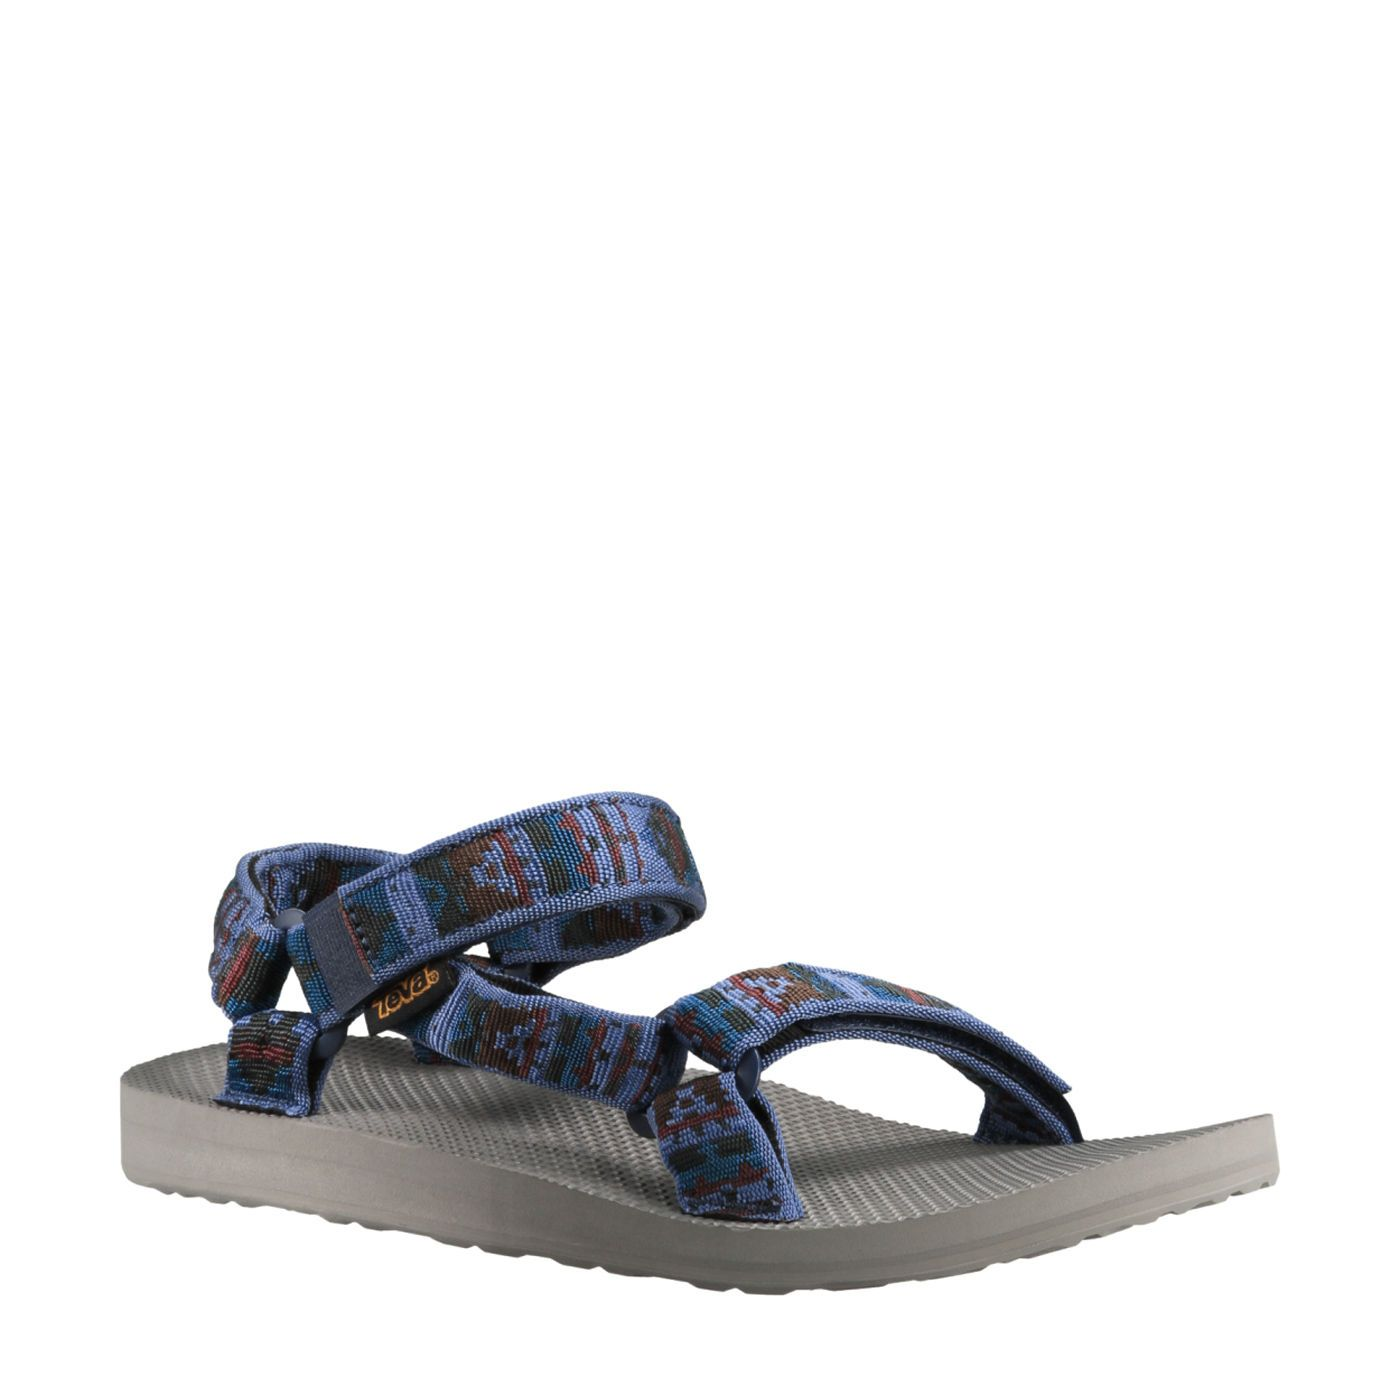 b178dd532 Men s Socks and Sandals